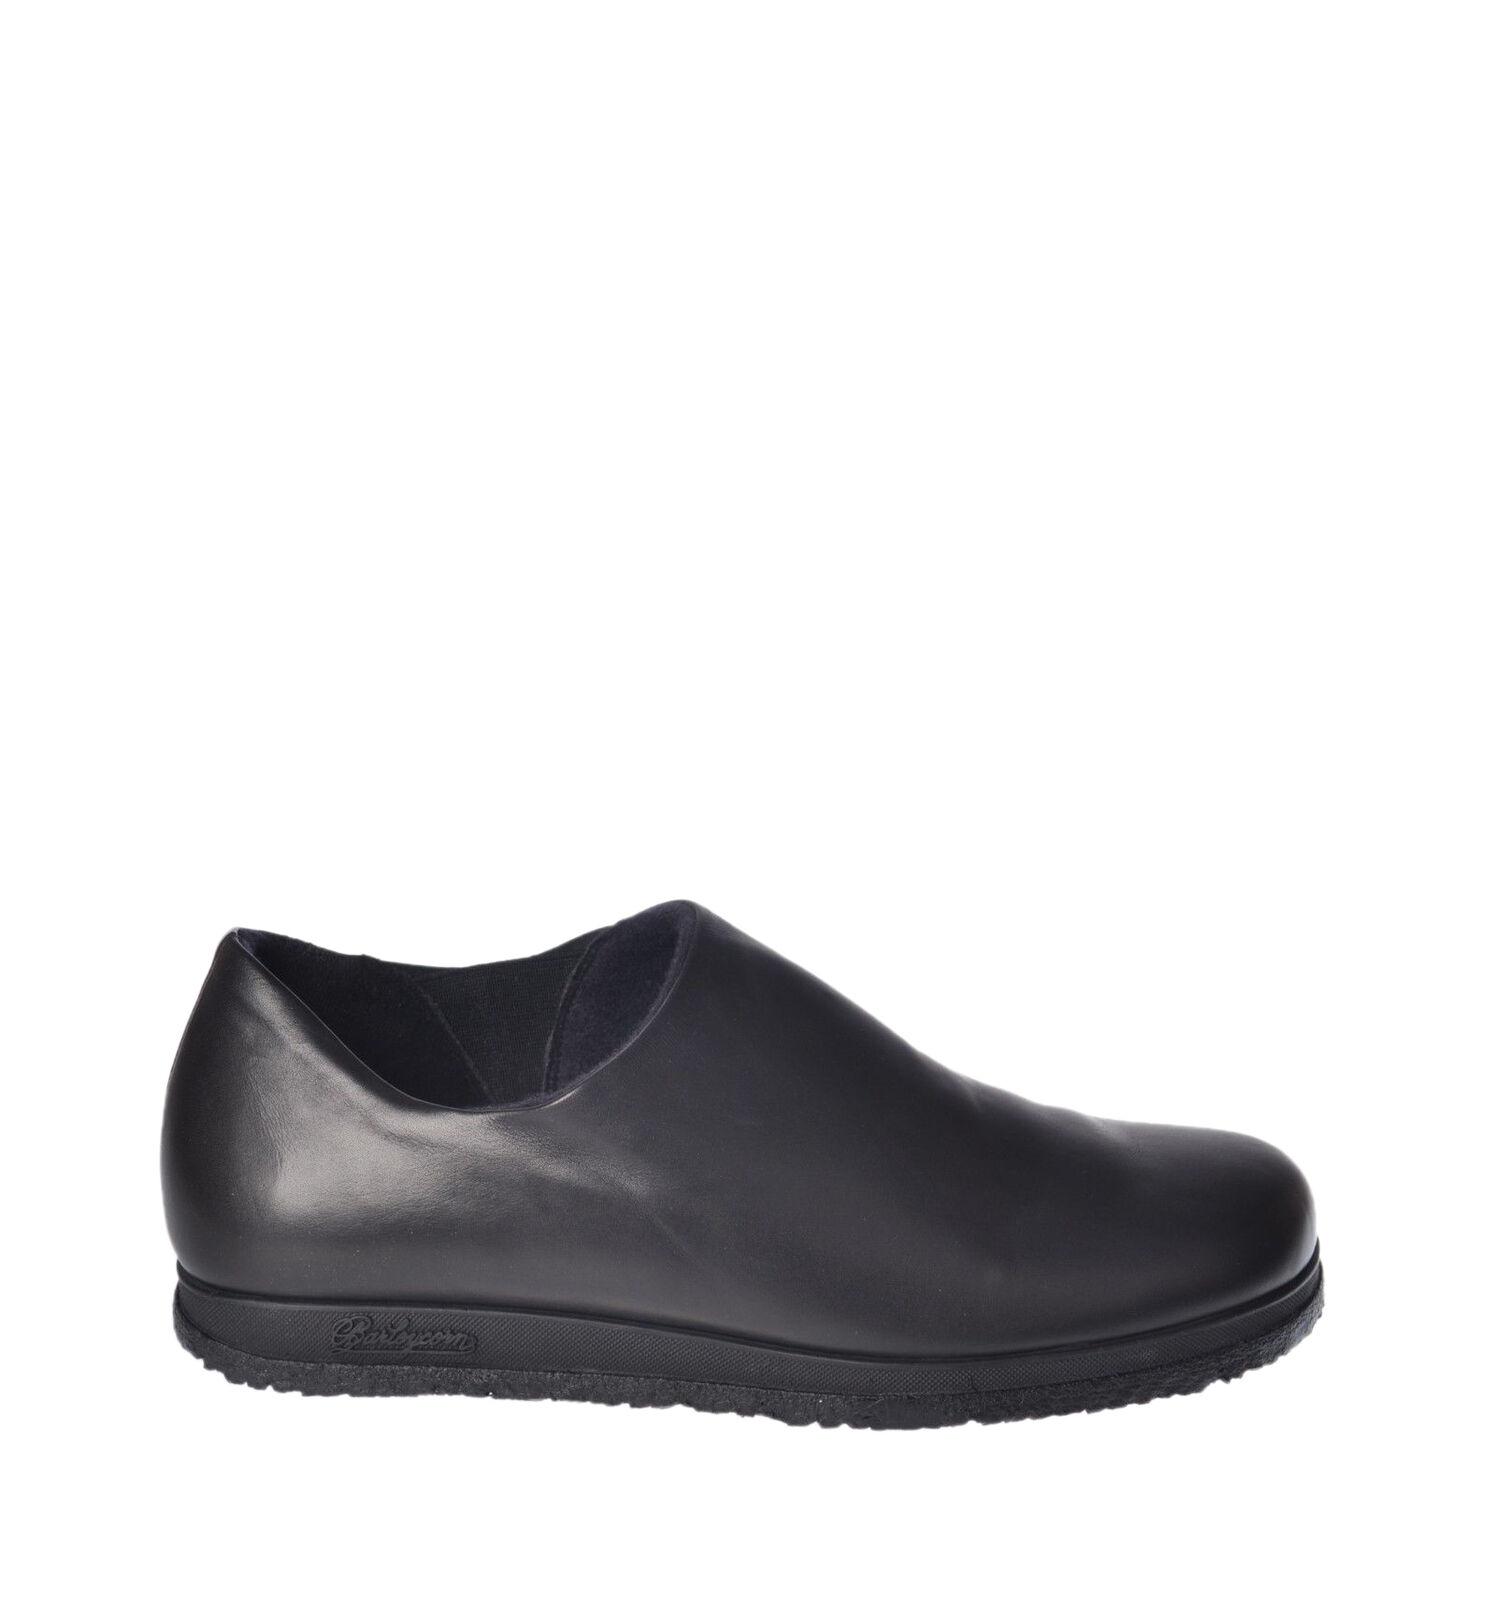 BARLEYCORN-Chaussures-baskets basse femme-noir - 5147120C183746